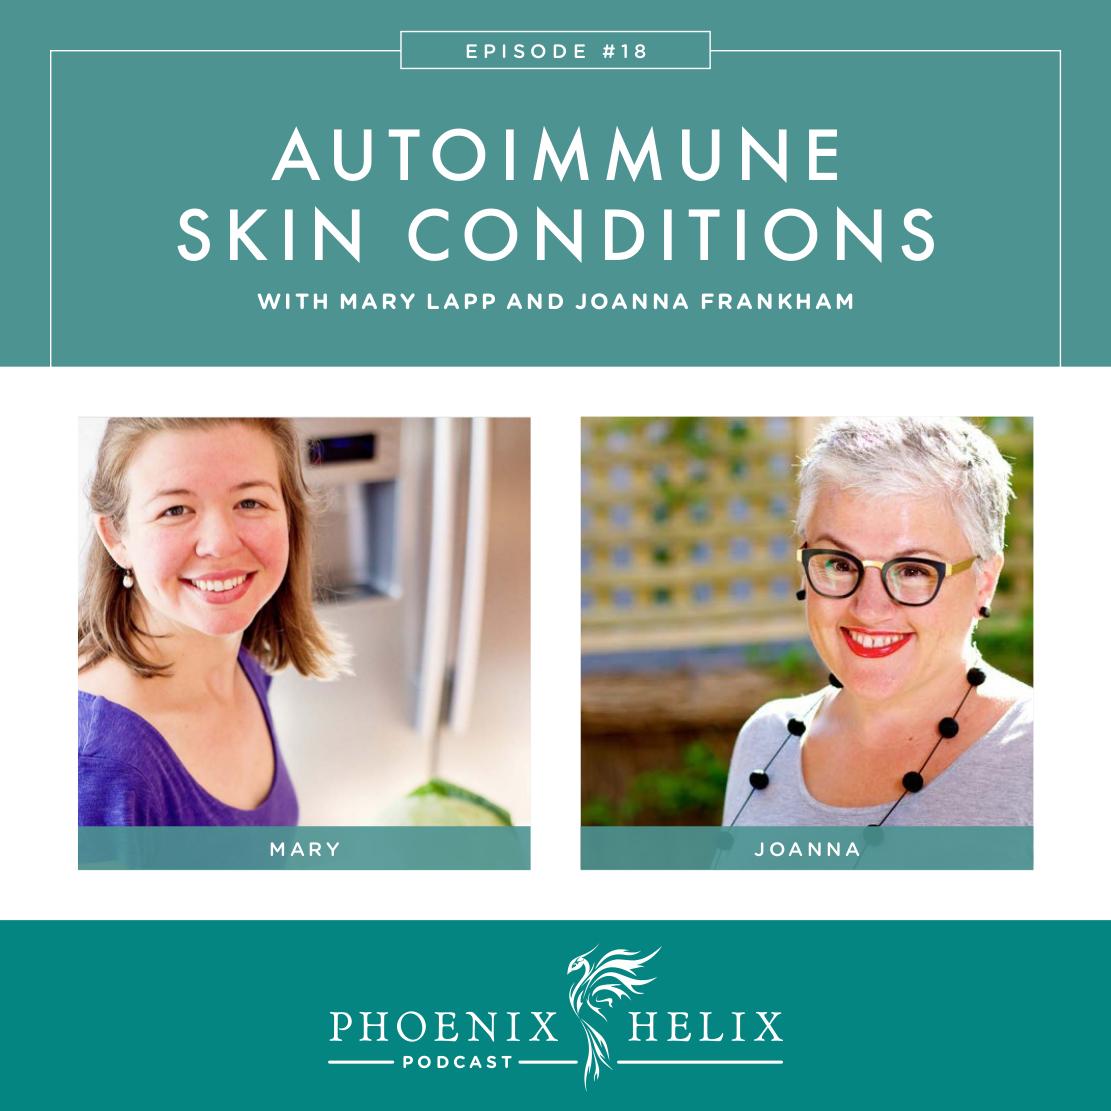 Autoimmune Skin Conditions | Phoenix Helix Podcast